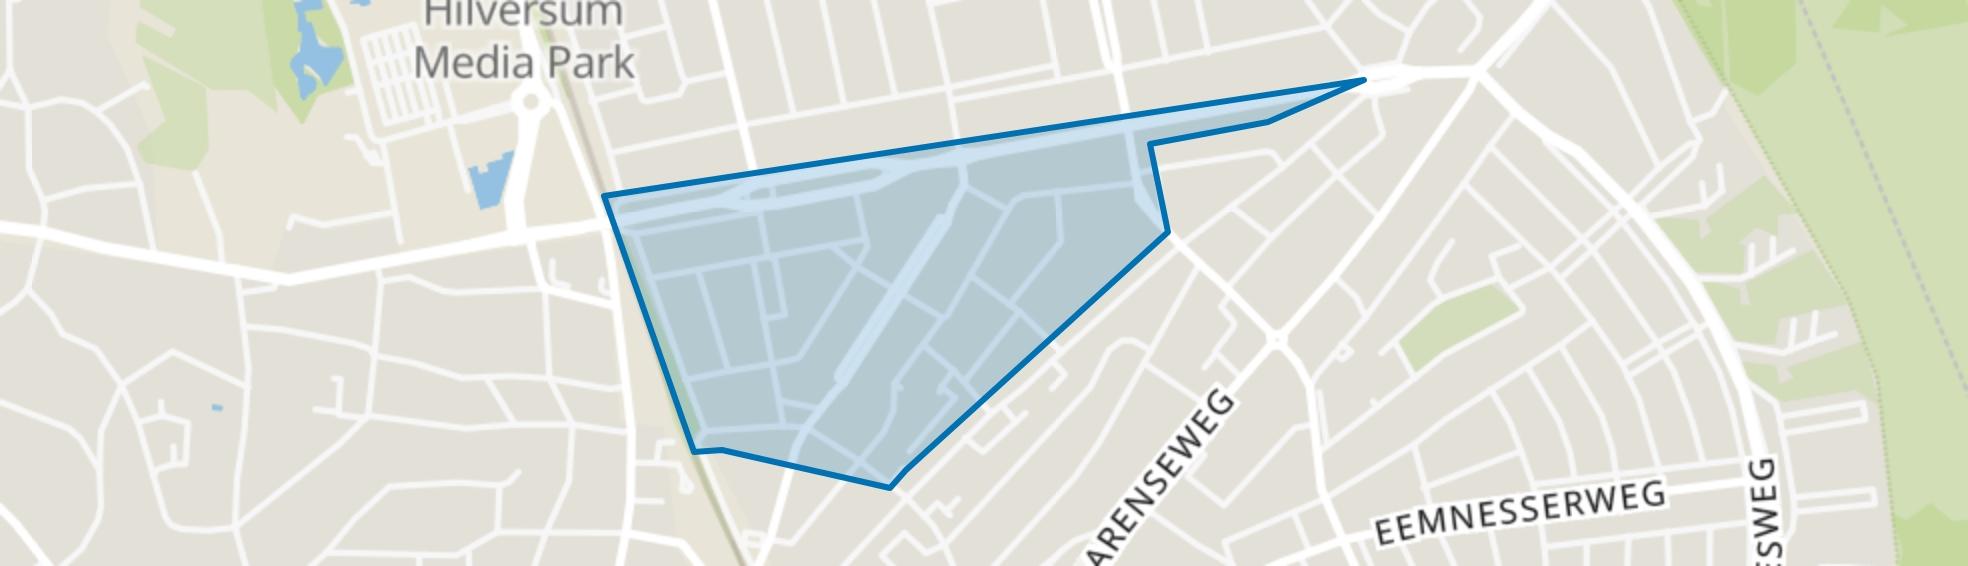 Johannes Geradtswegbuurt, Hilversum map